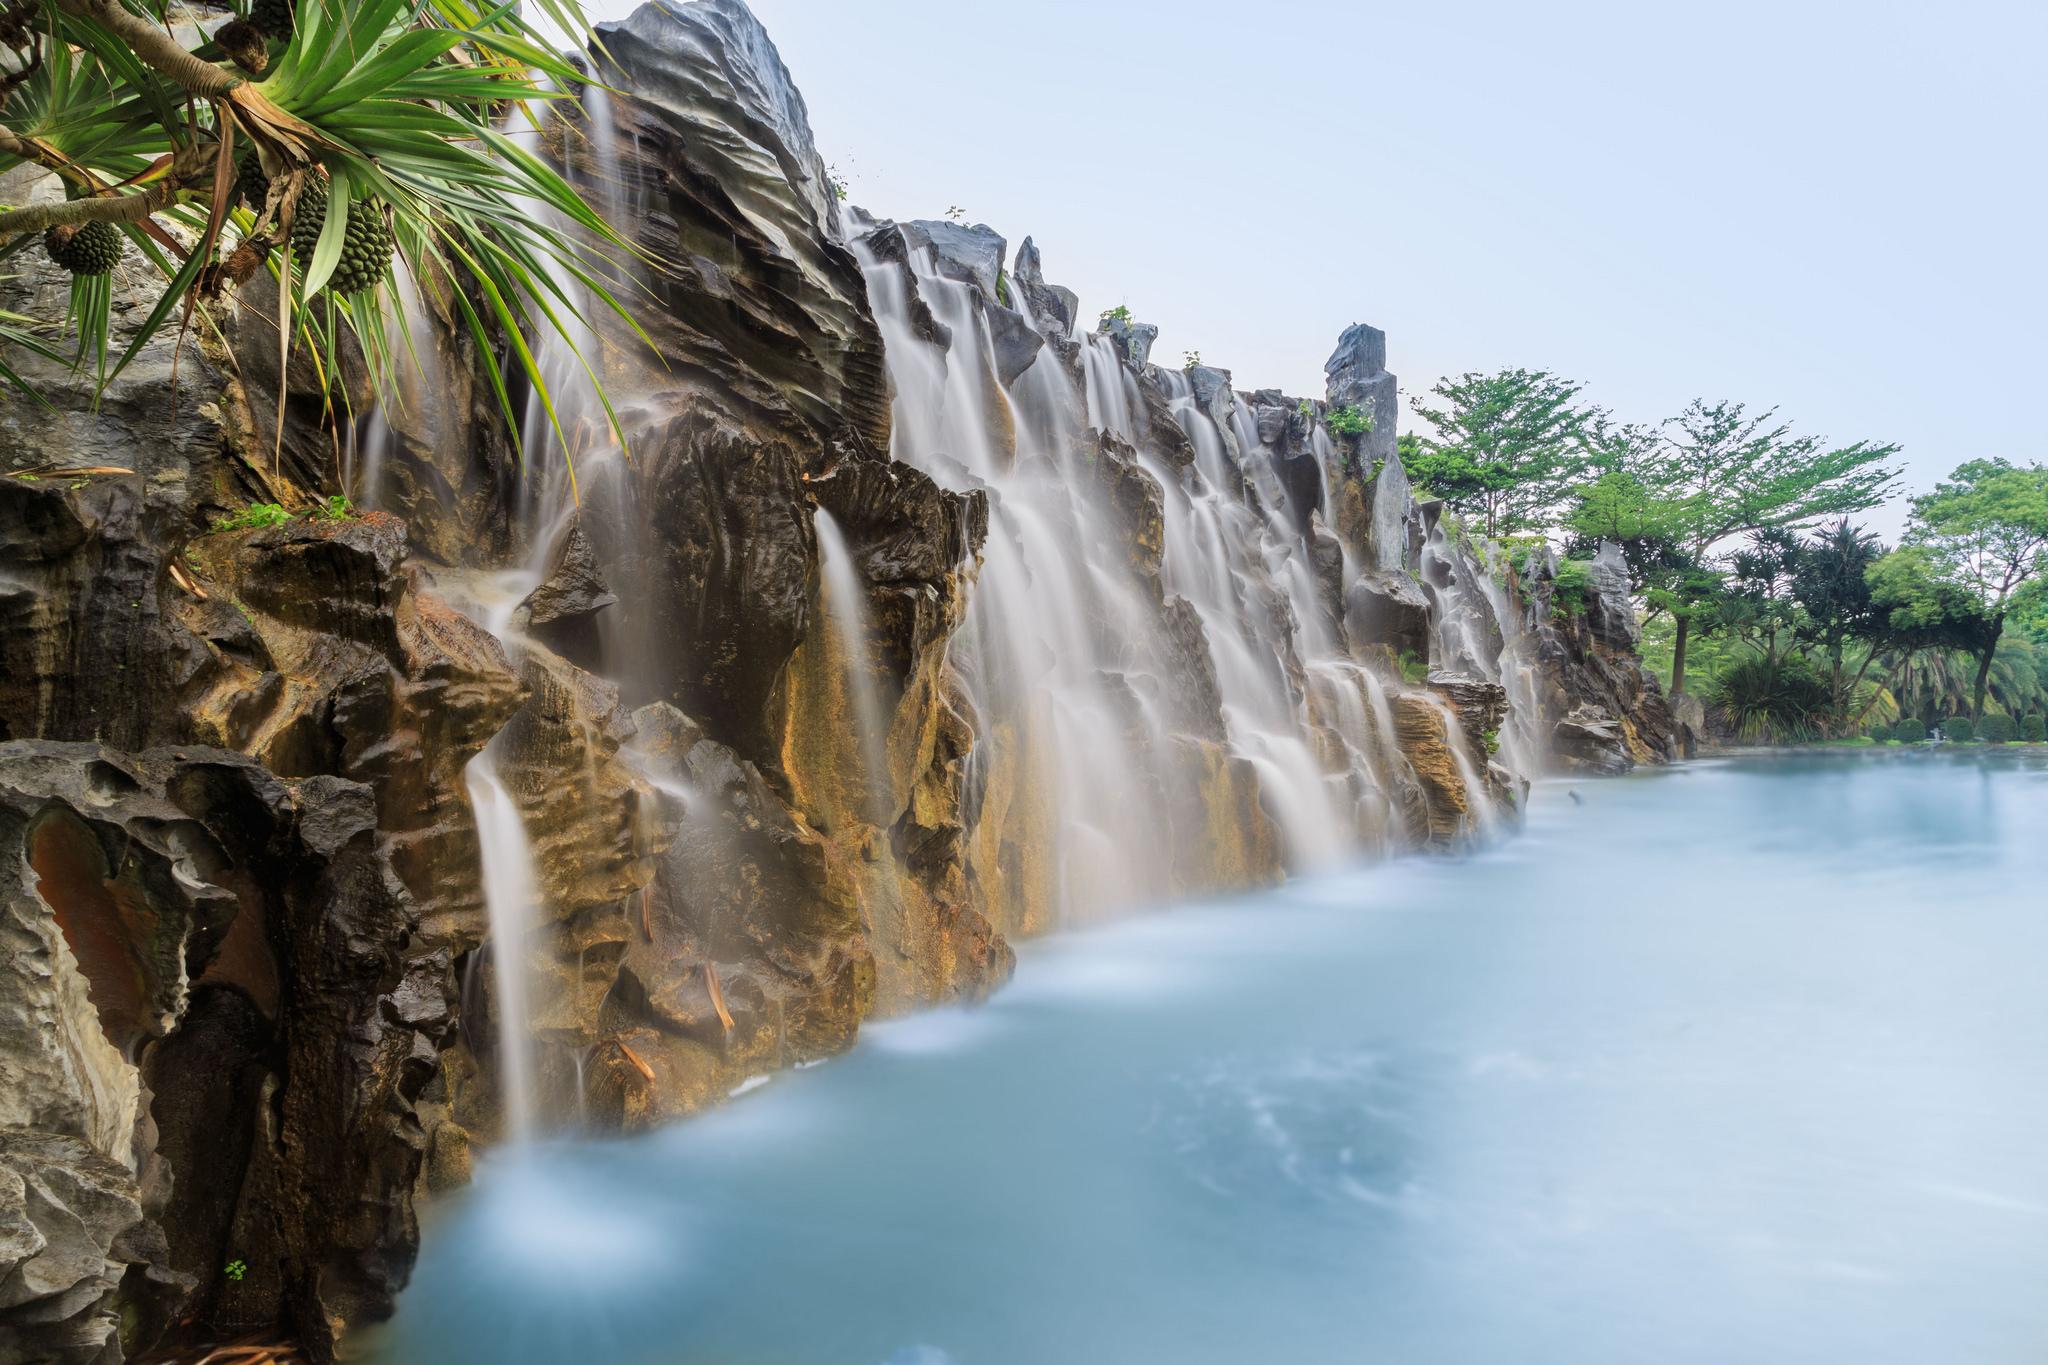 Waterfall at Parkview hotel, Taiwan